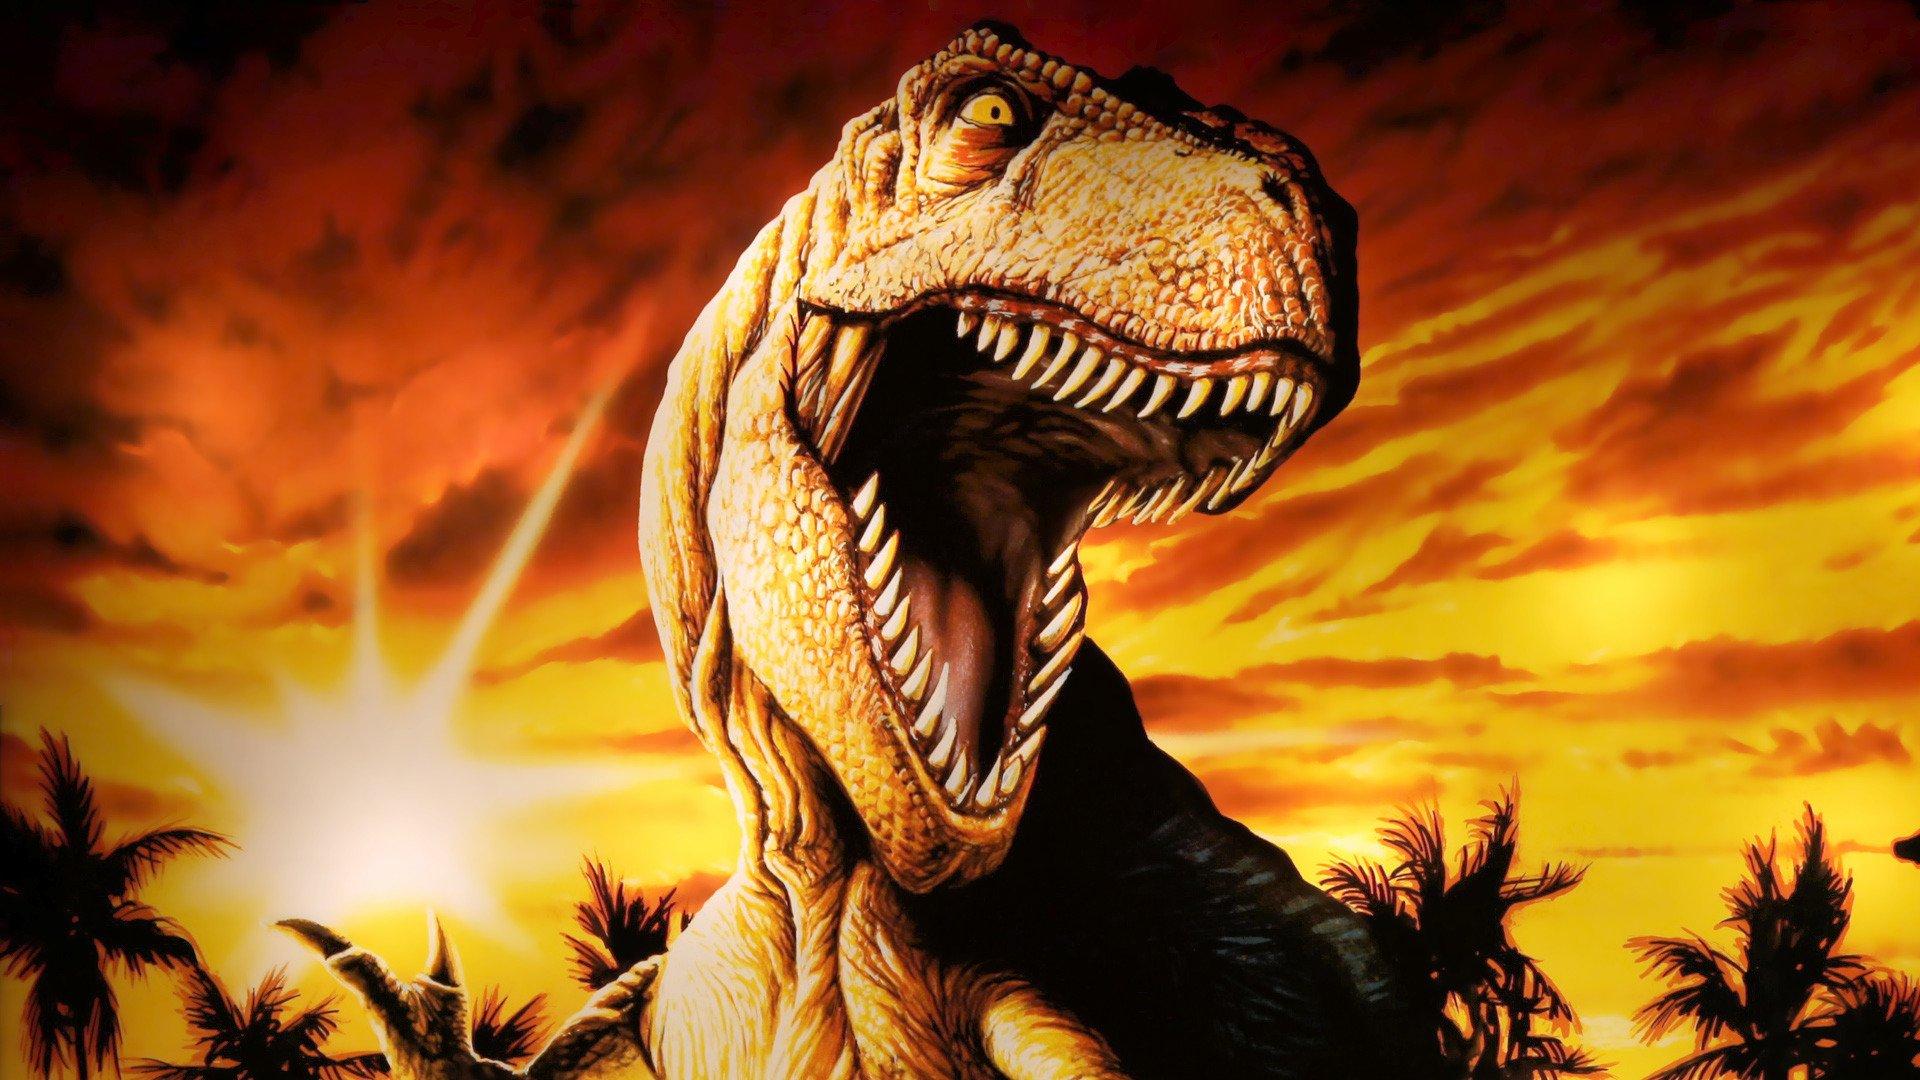 JURASSIC PARK adventure sci-fi fantasy dinosaur movie film ...